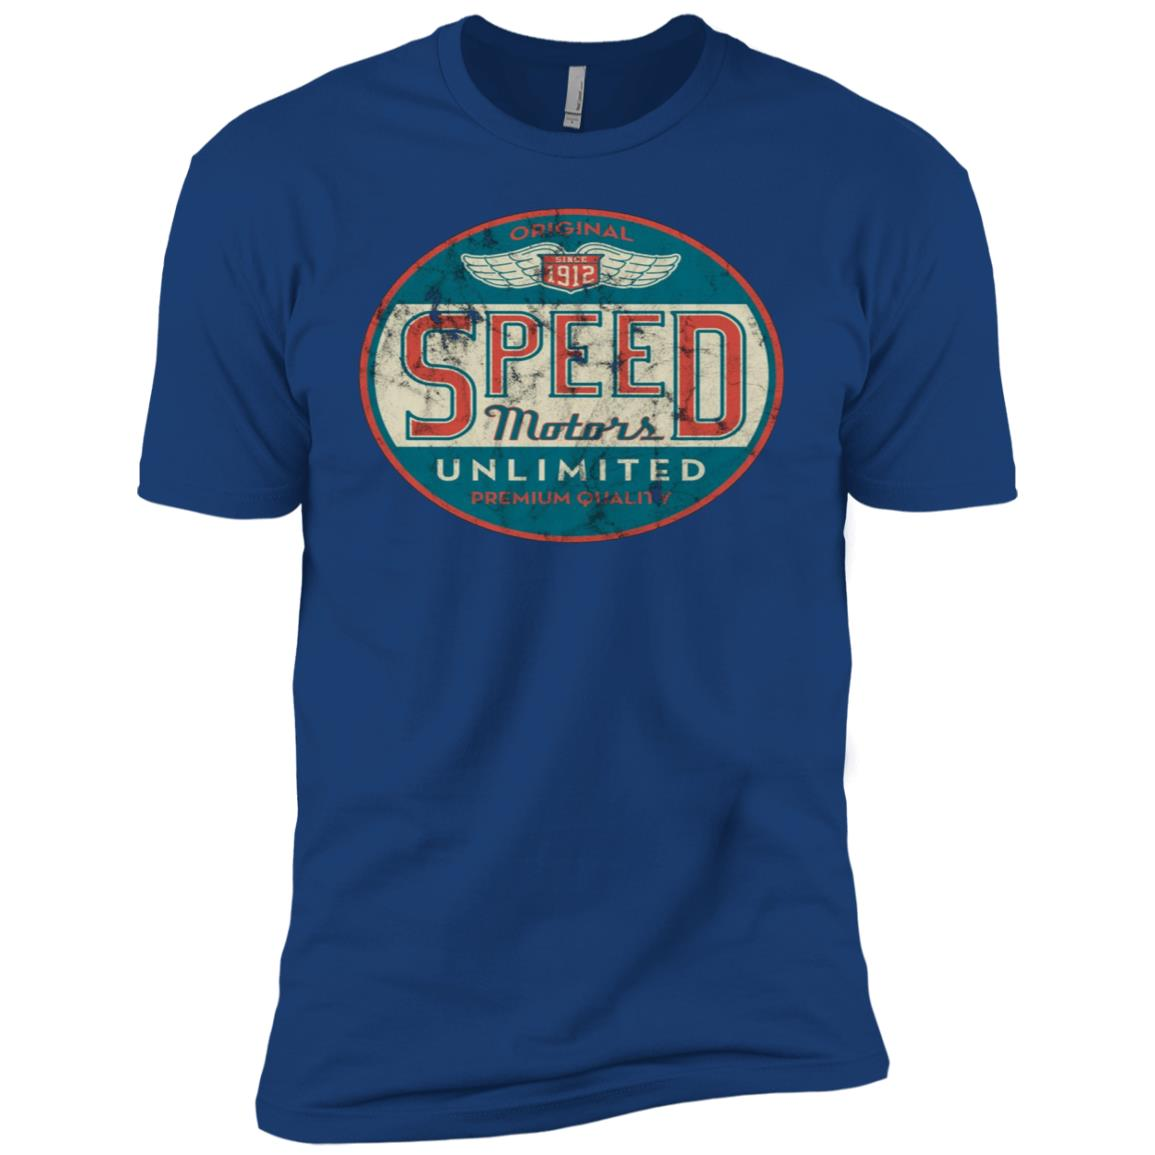 Vintage Speed Motor (distresseds women & men) Men Short Sleeve T-Shirt